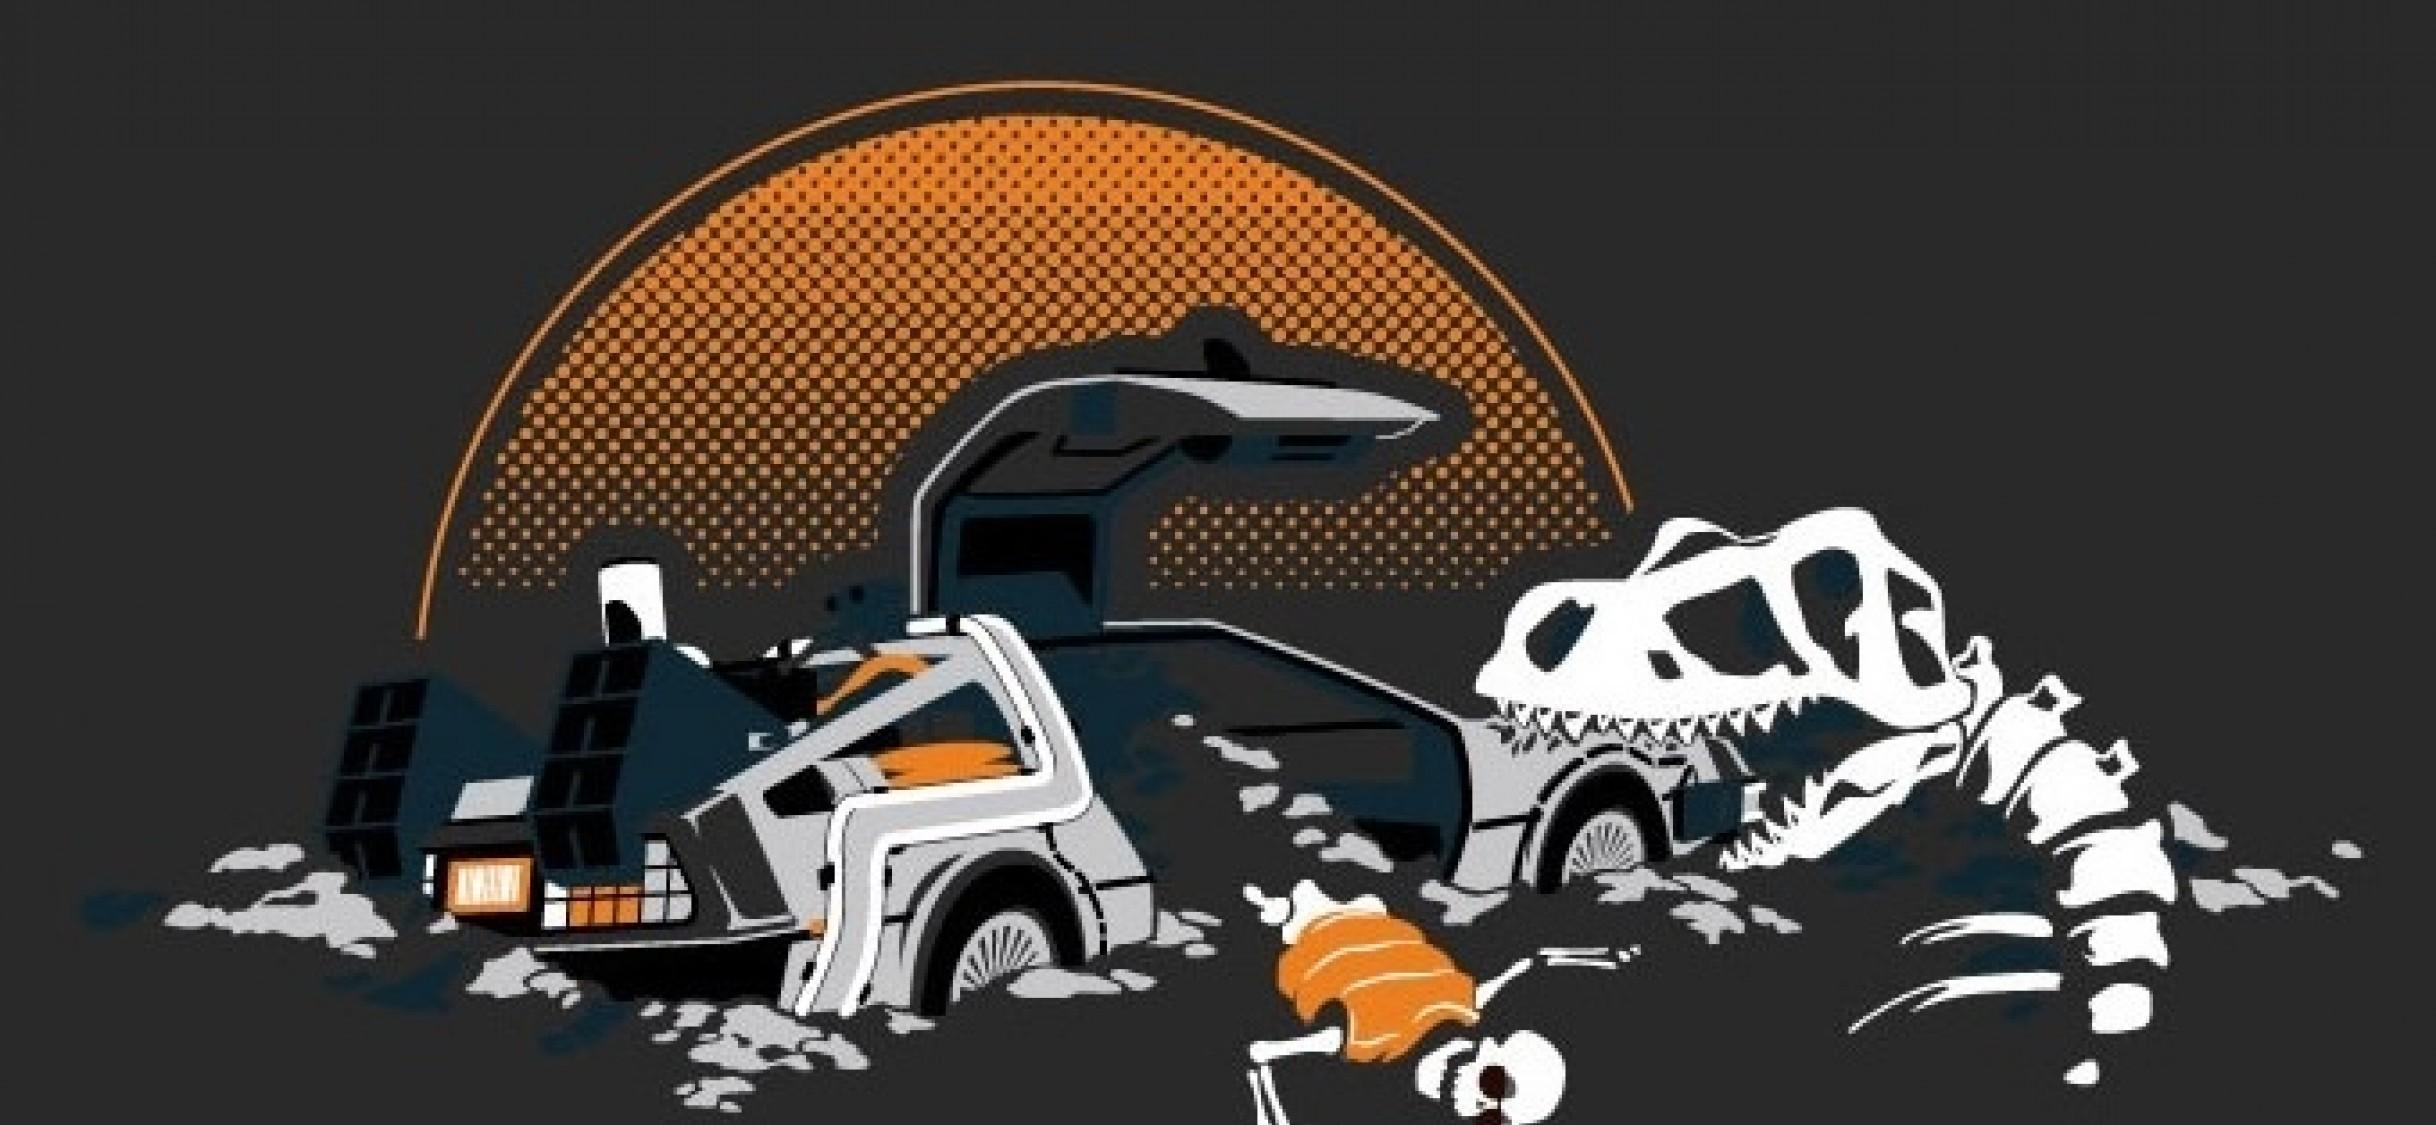 Back 2 The Future Art , HD Wallpaper & Backgrounds